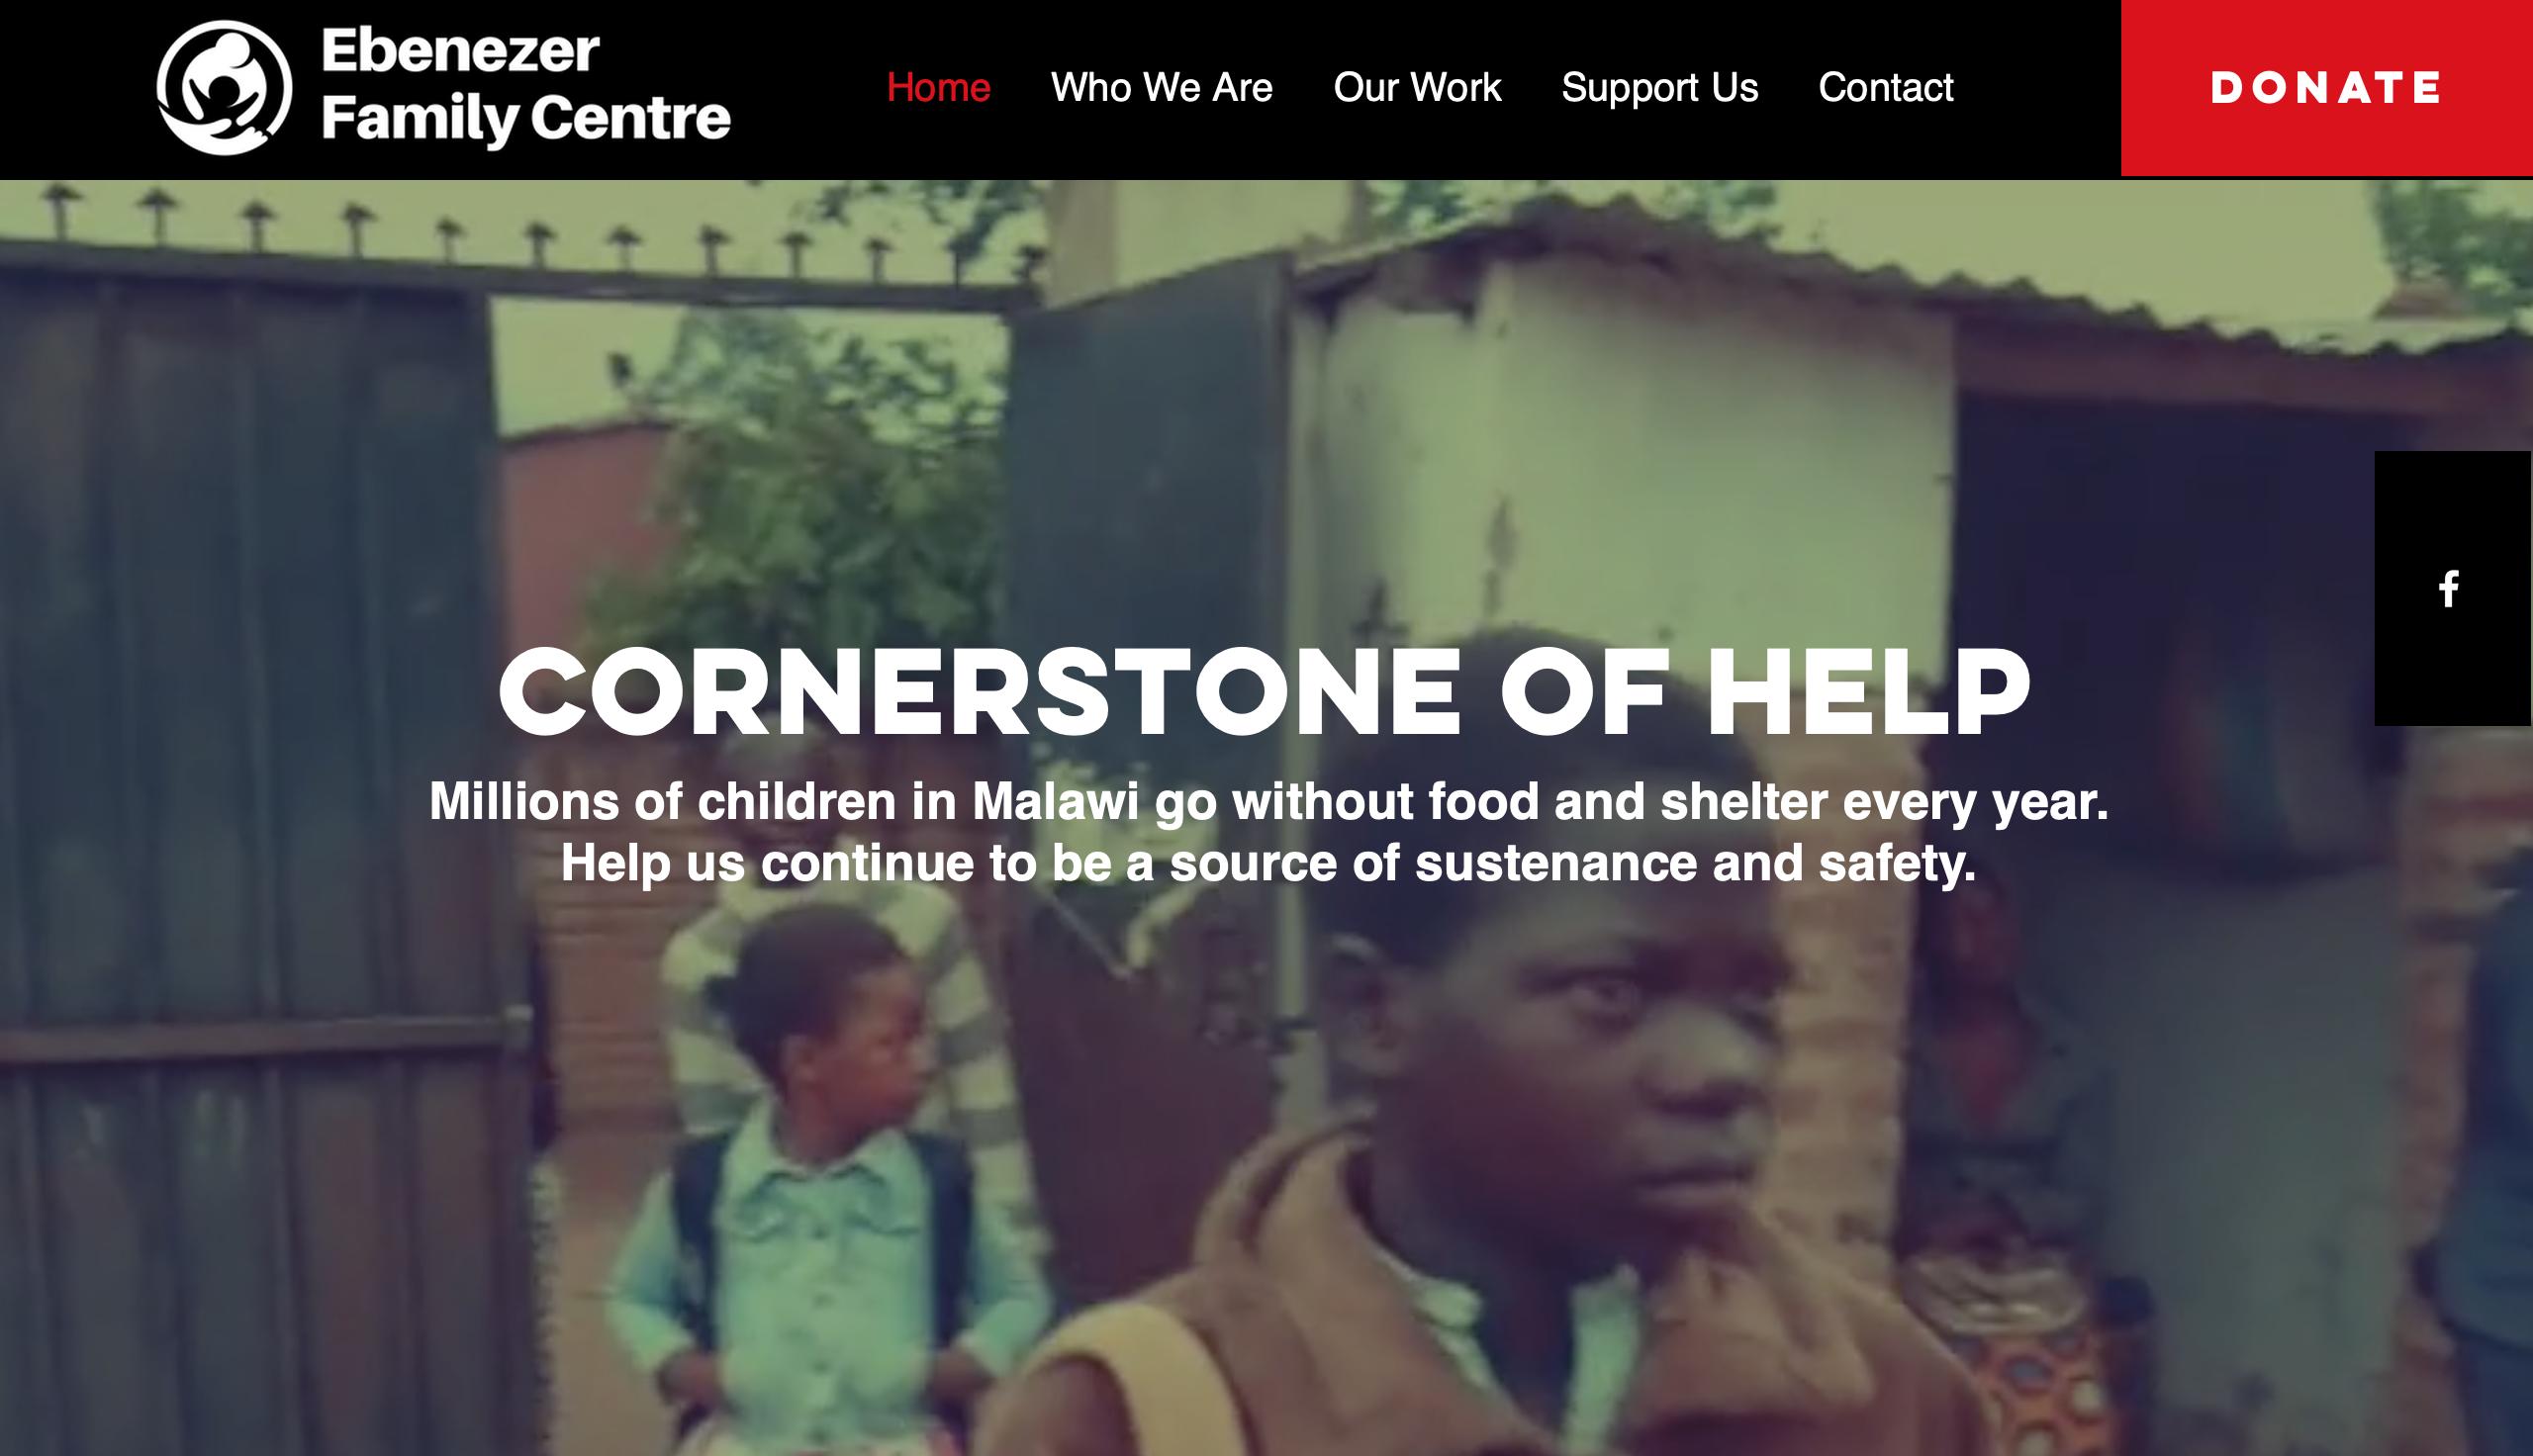 Ebenezer Family Centre Website